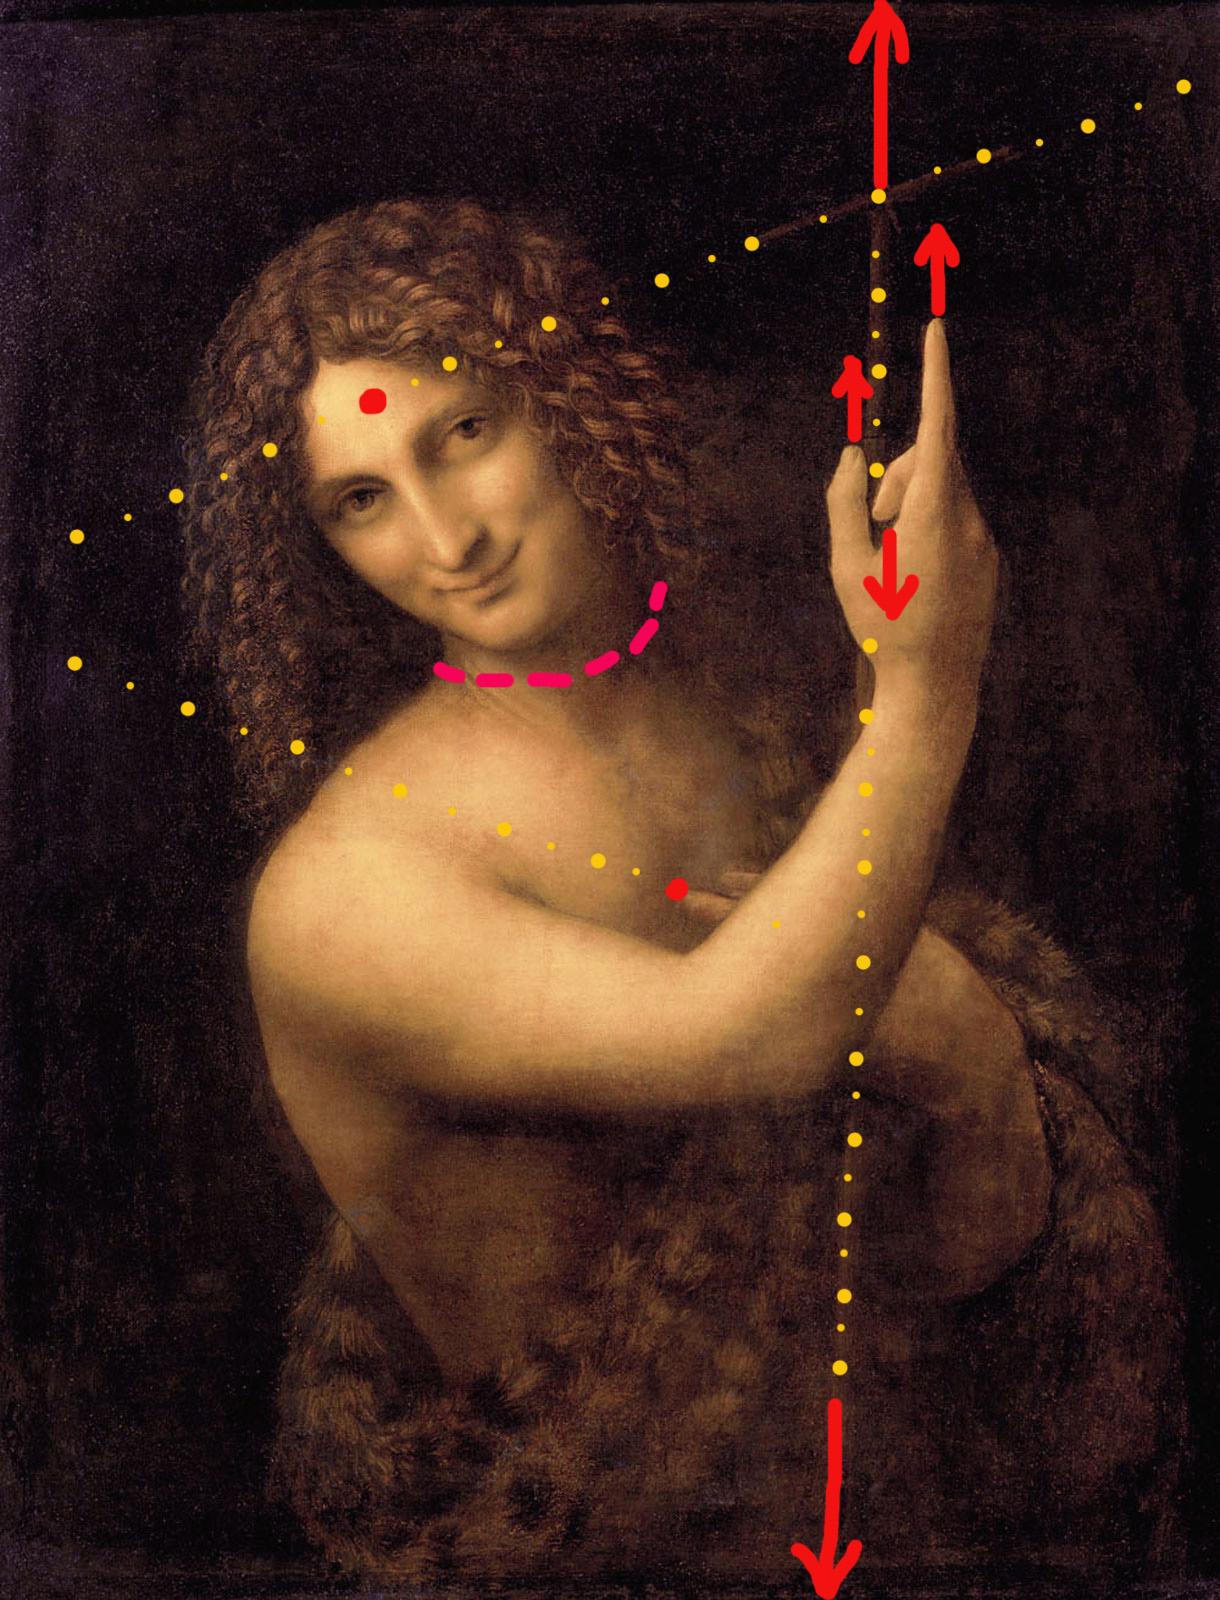 Bacco Artolini Leonardo Da Vinci intervento